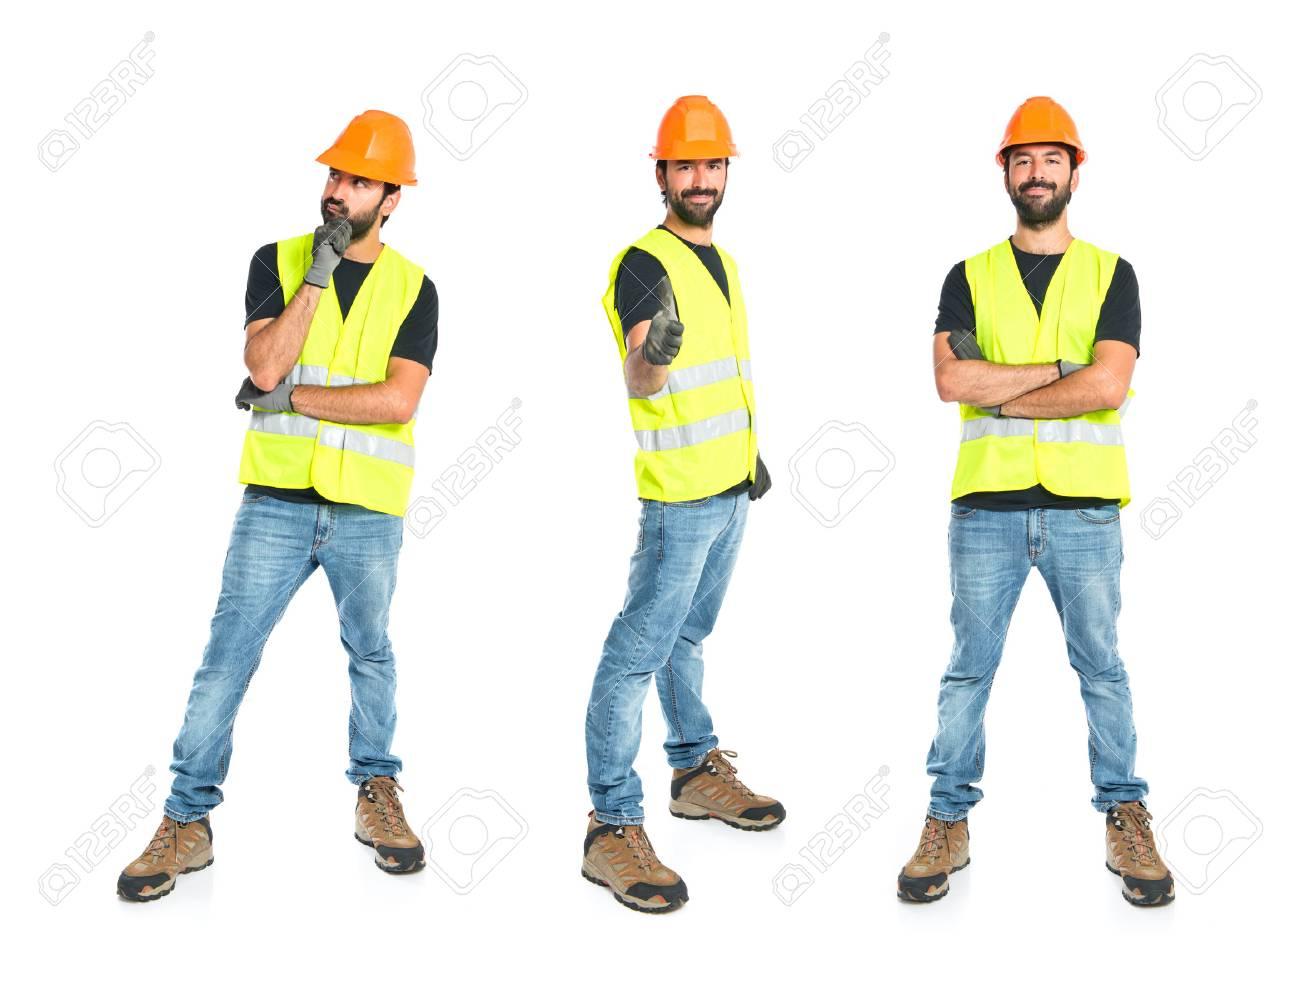 Workman thinking over isolated white background - 35219136